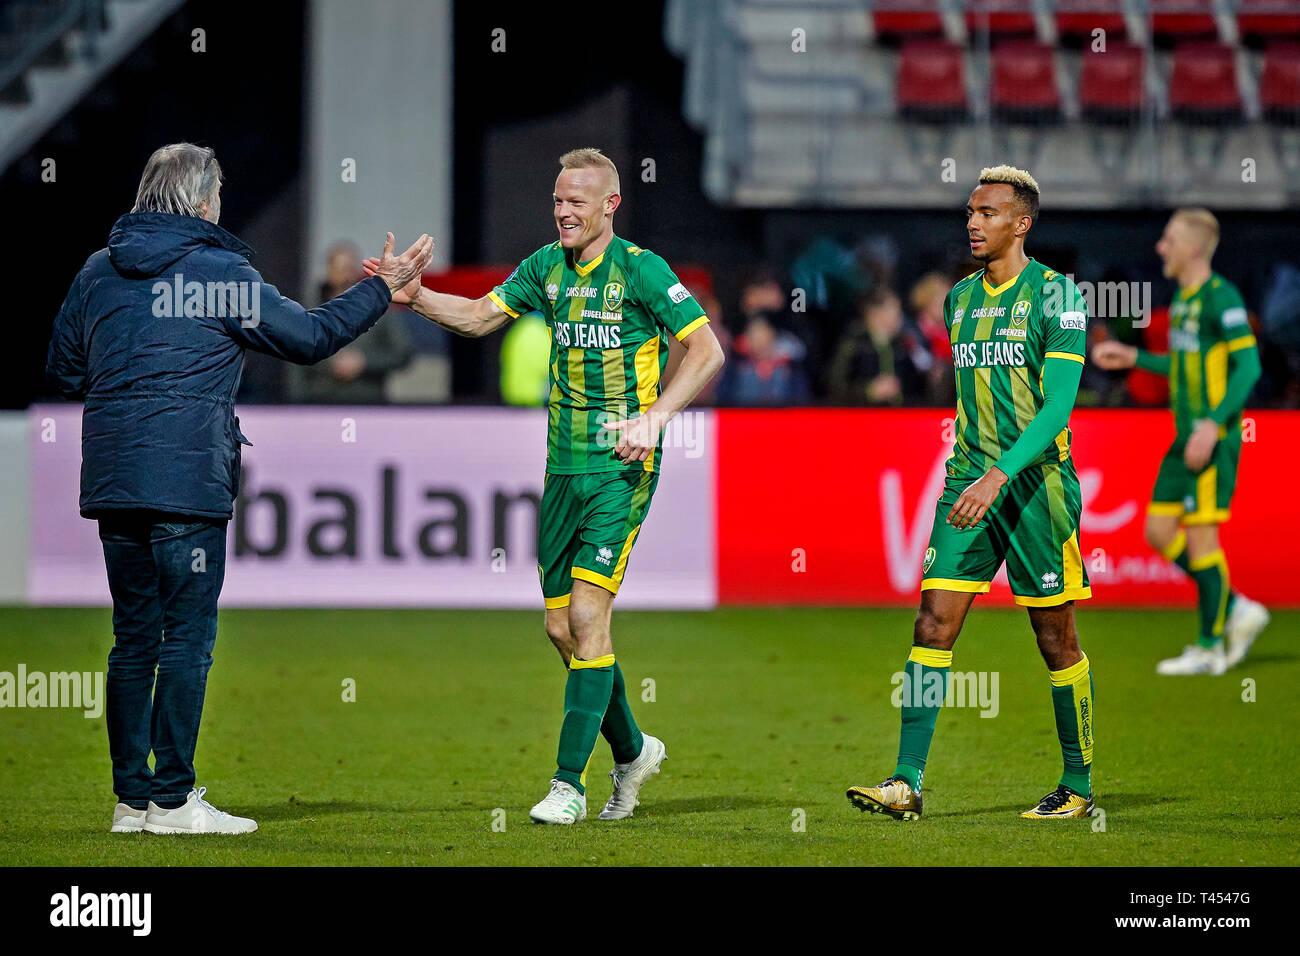 Alkmaar Az Ado Den Haag 13 04 2019 Football Dutch Eredivisie Season 2018 2019 Afas Stadium Ado Player Tom Beugelsdijk C Celebrating The Win After The Game Az Ado 2 3 Stock Photo Alamy